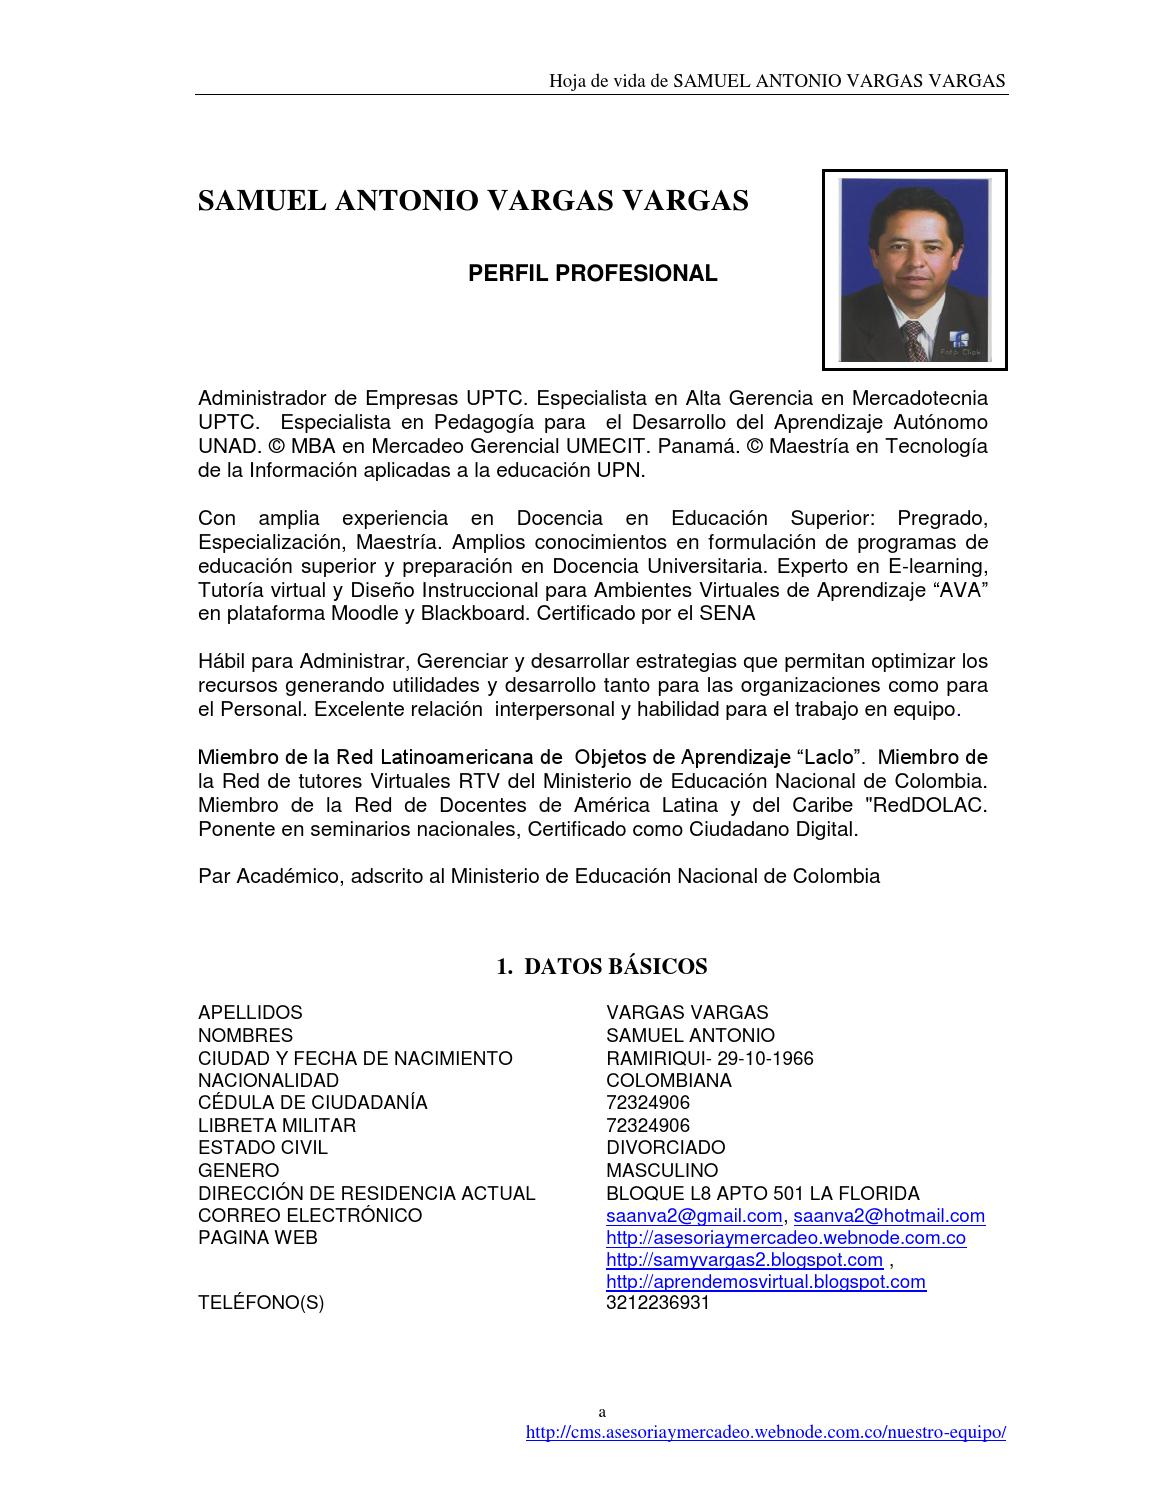 Hoja de vida samuel vargas actualizada by saanva2 - issuu